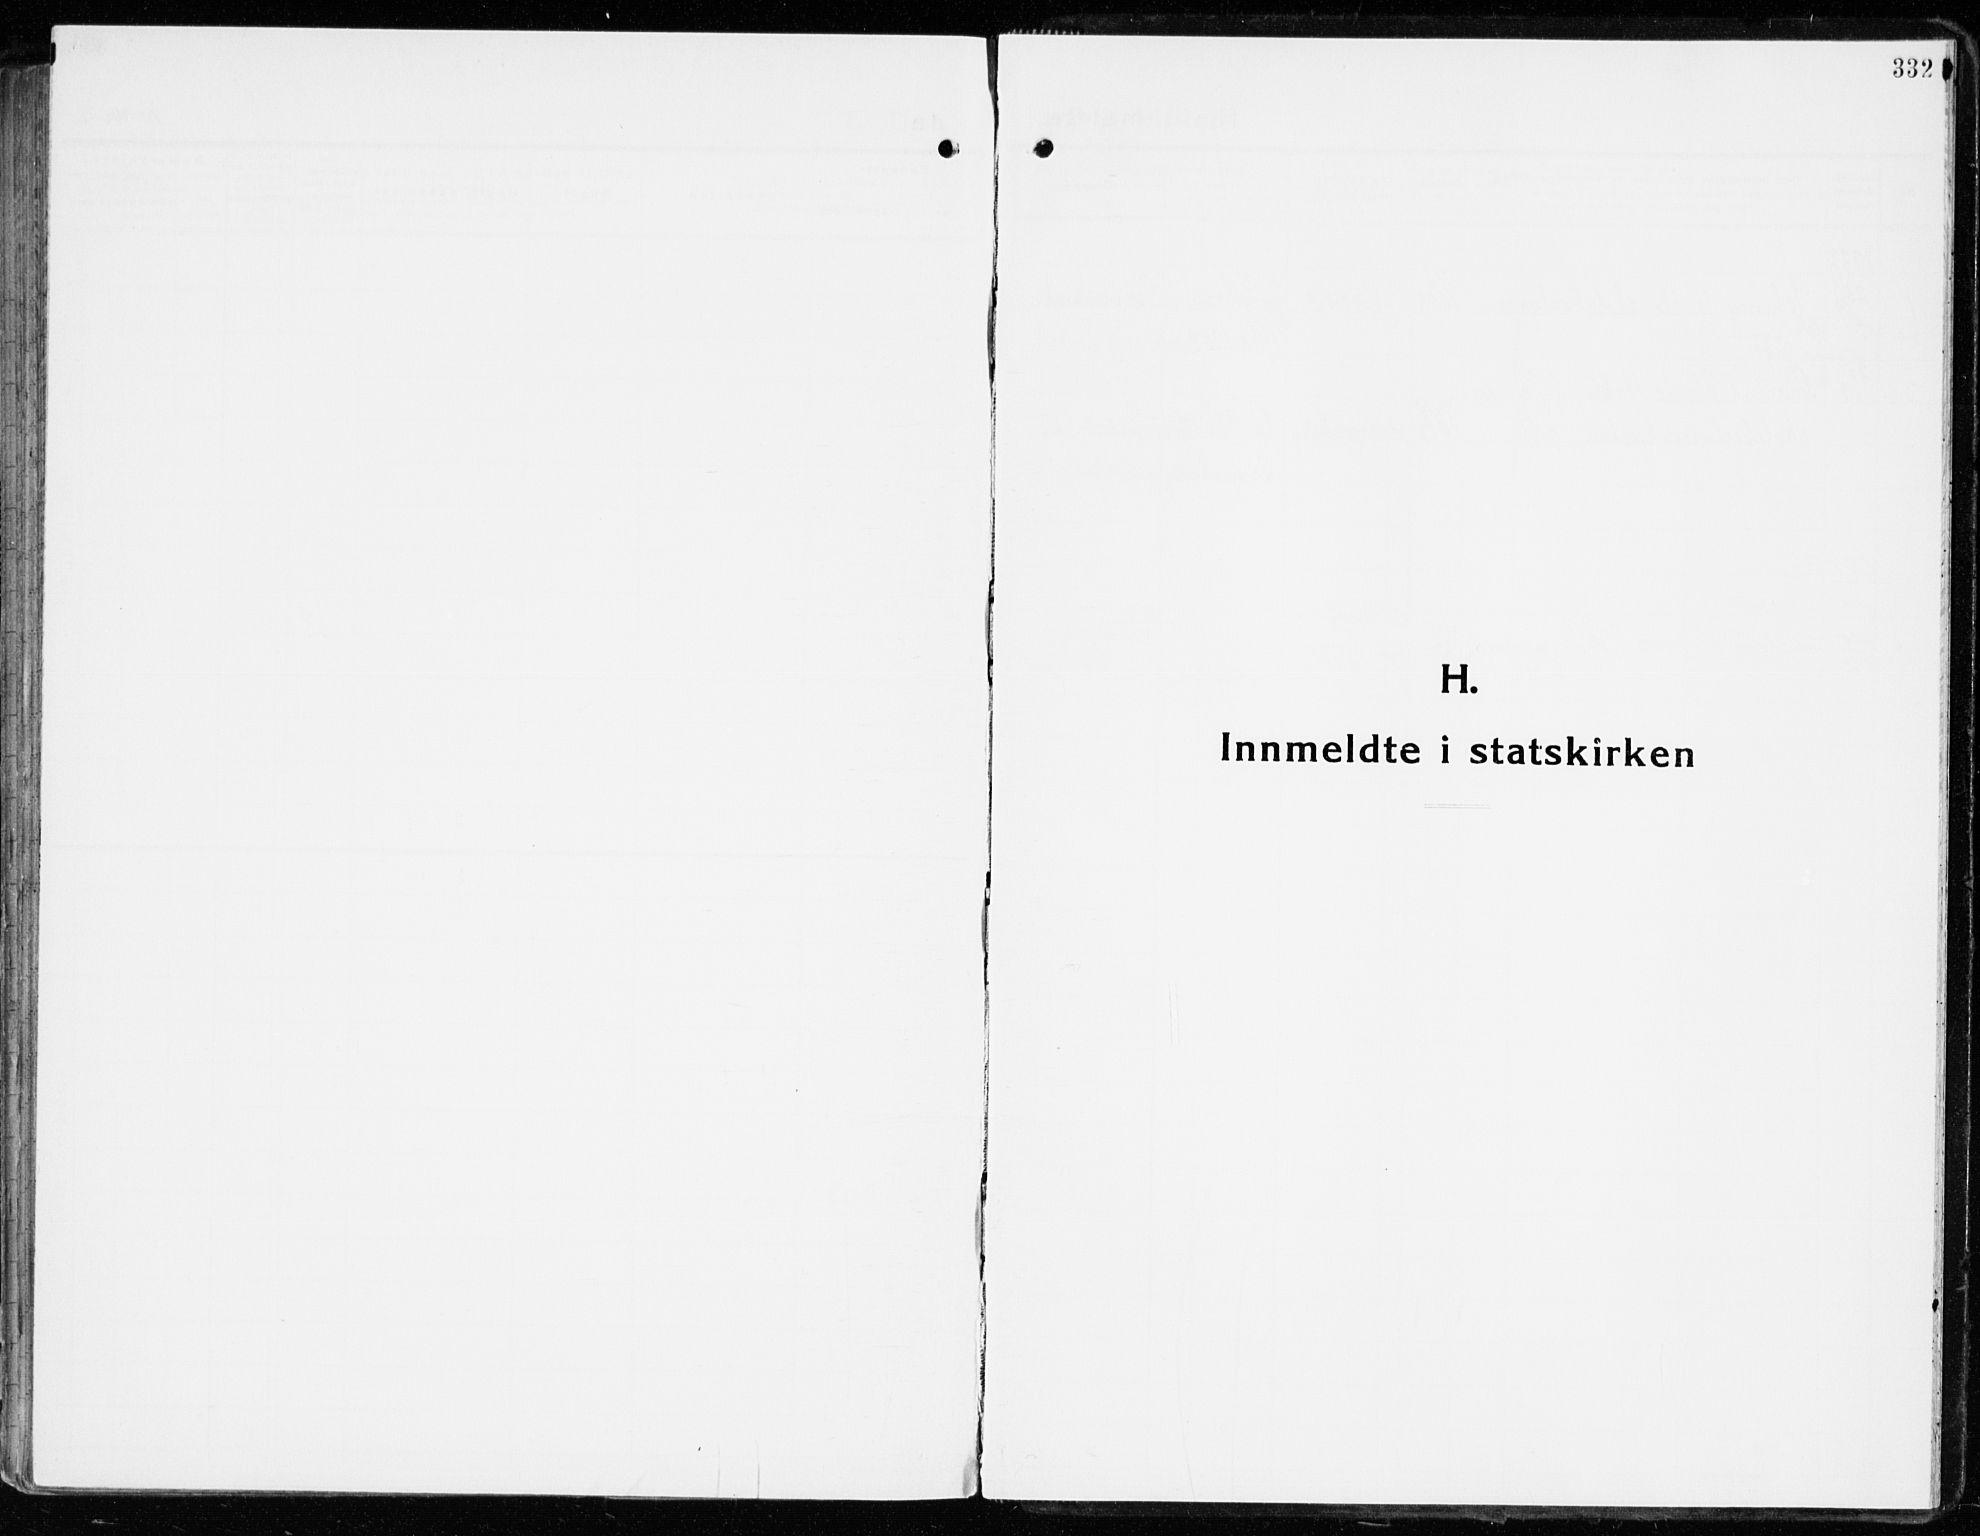 SAH, Stange prestekontor, K/L0027: Ministerialbok nr. 27, 1937-1947, s. 332